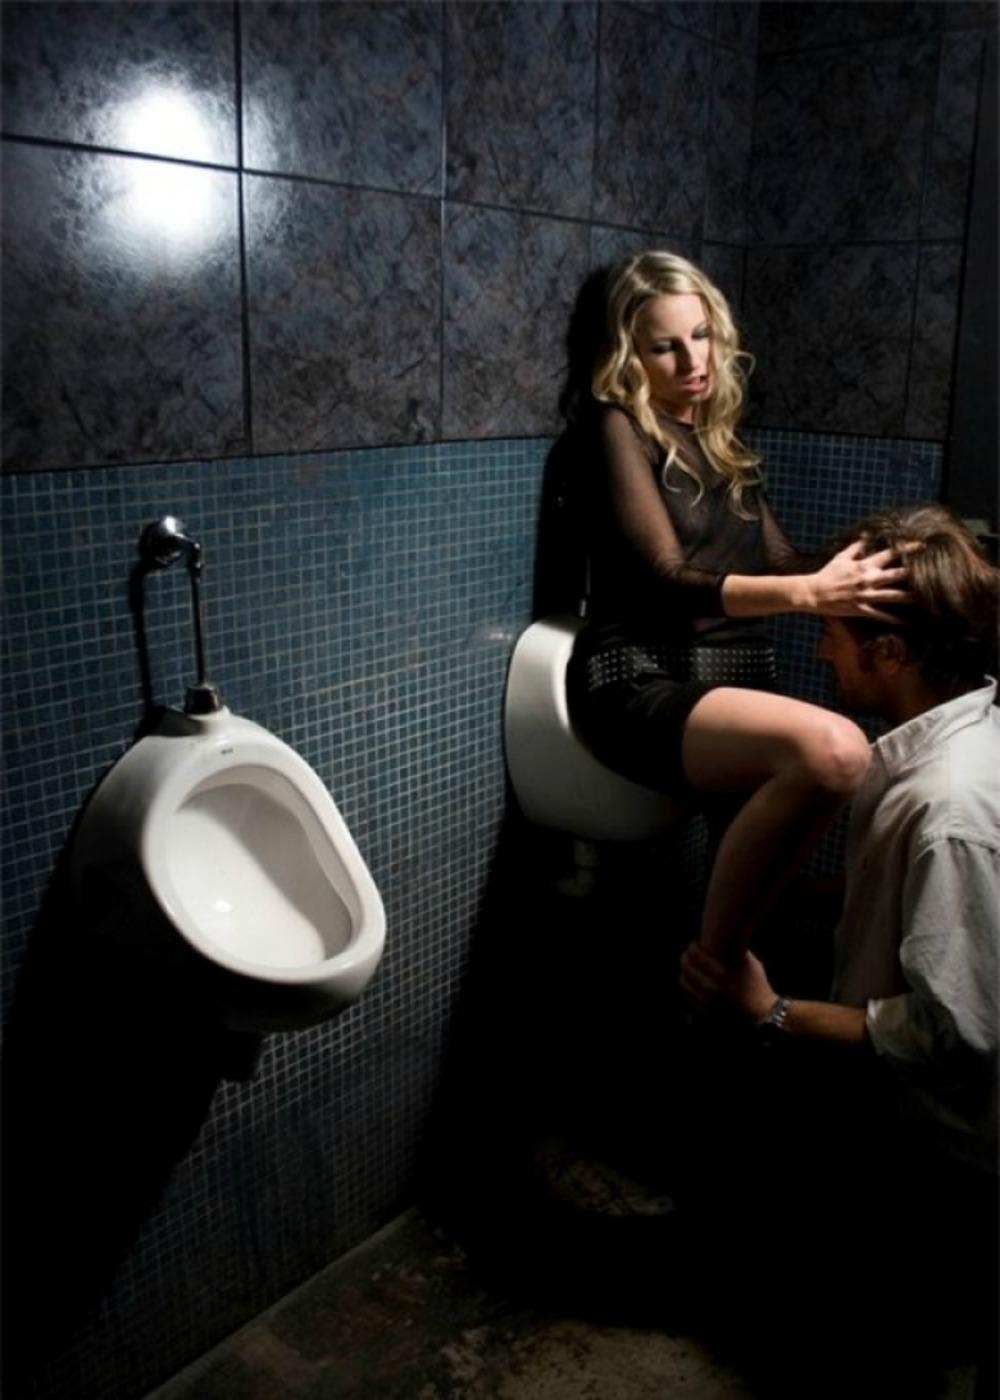 urinal-sex